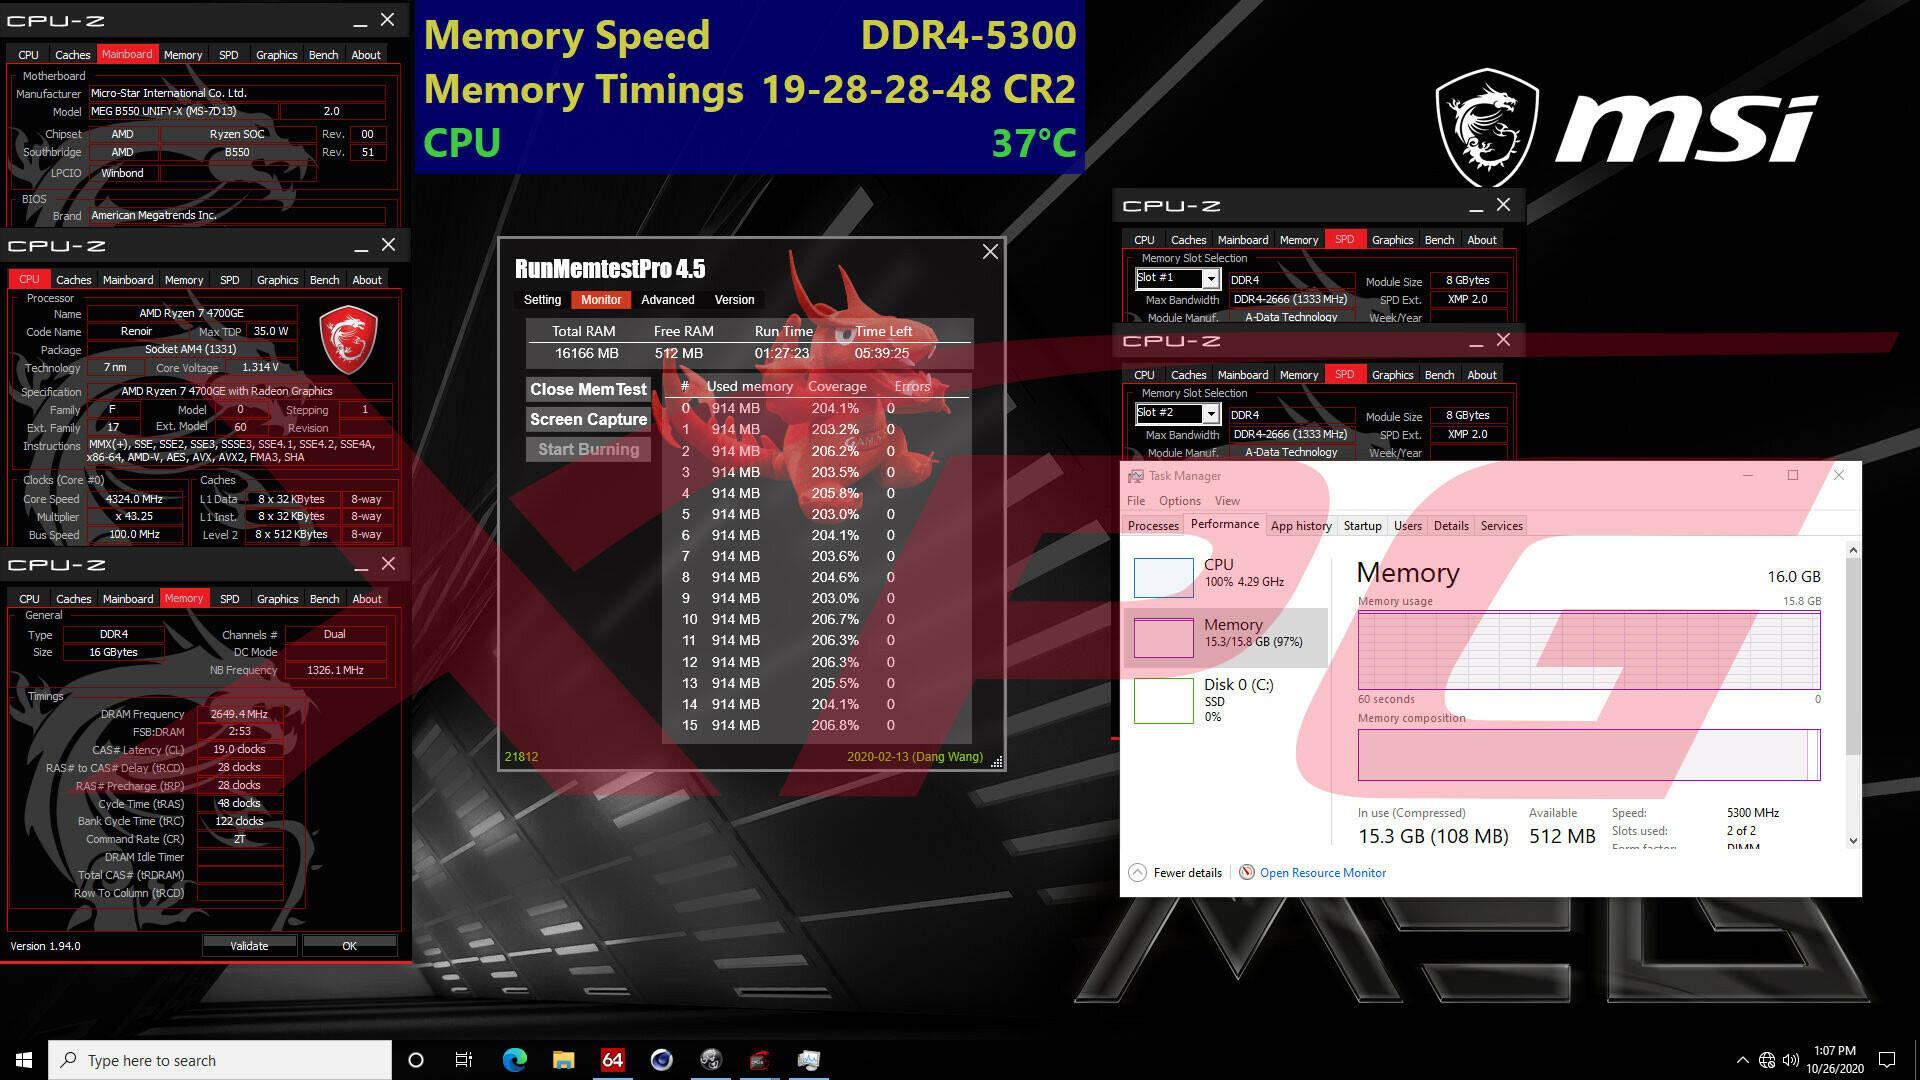 Adata Spectrix D50 Xtreme